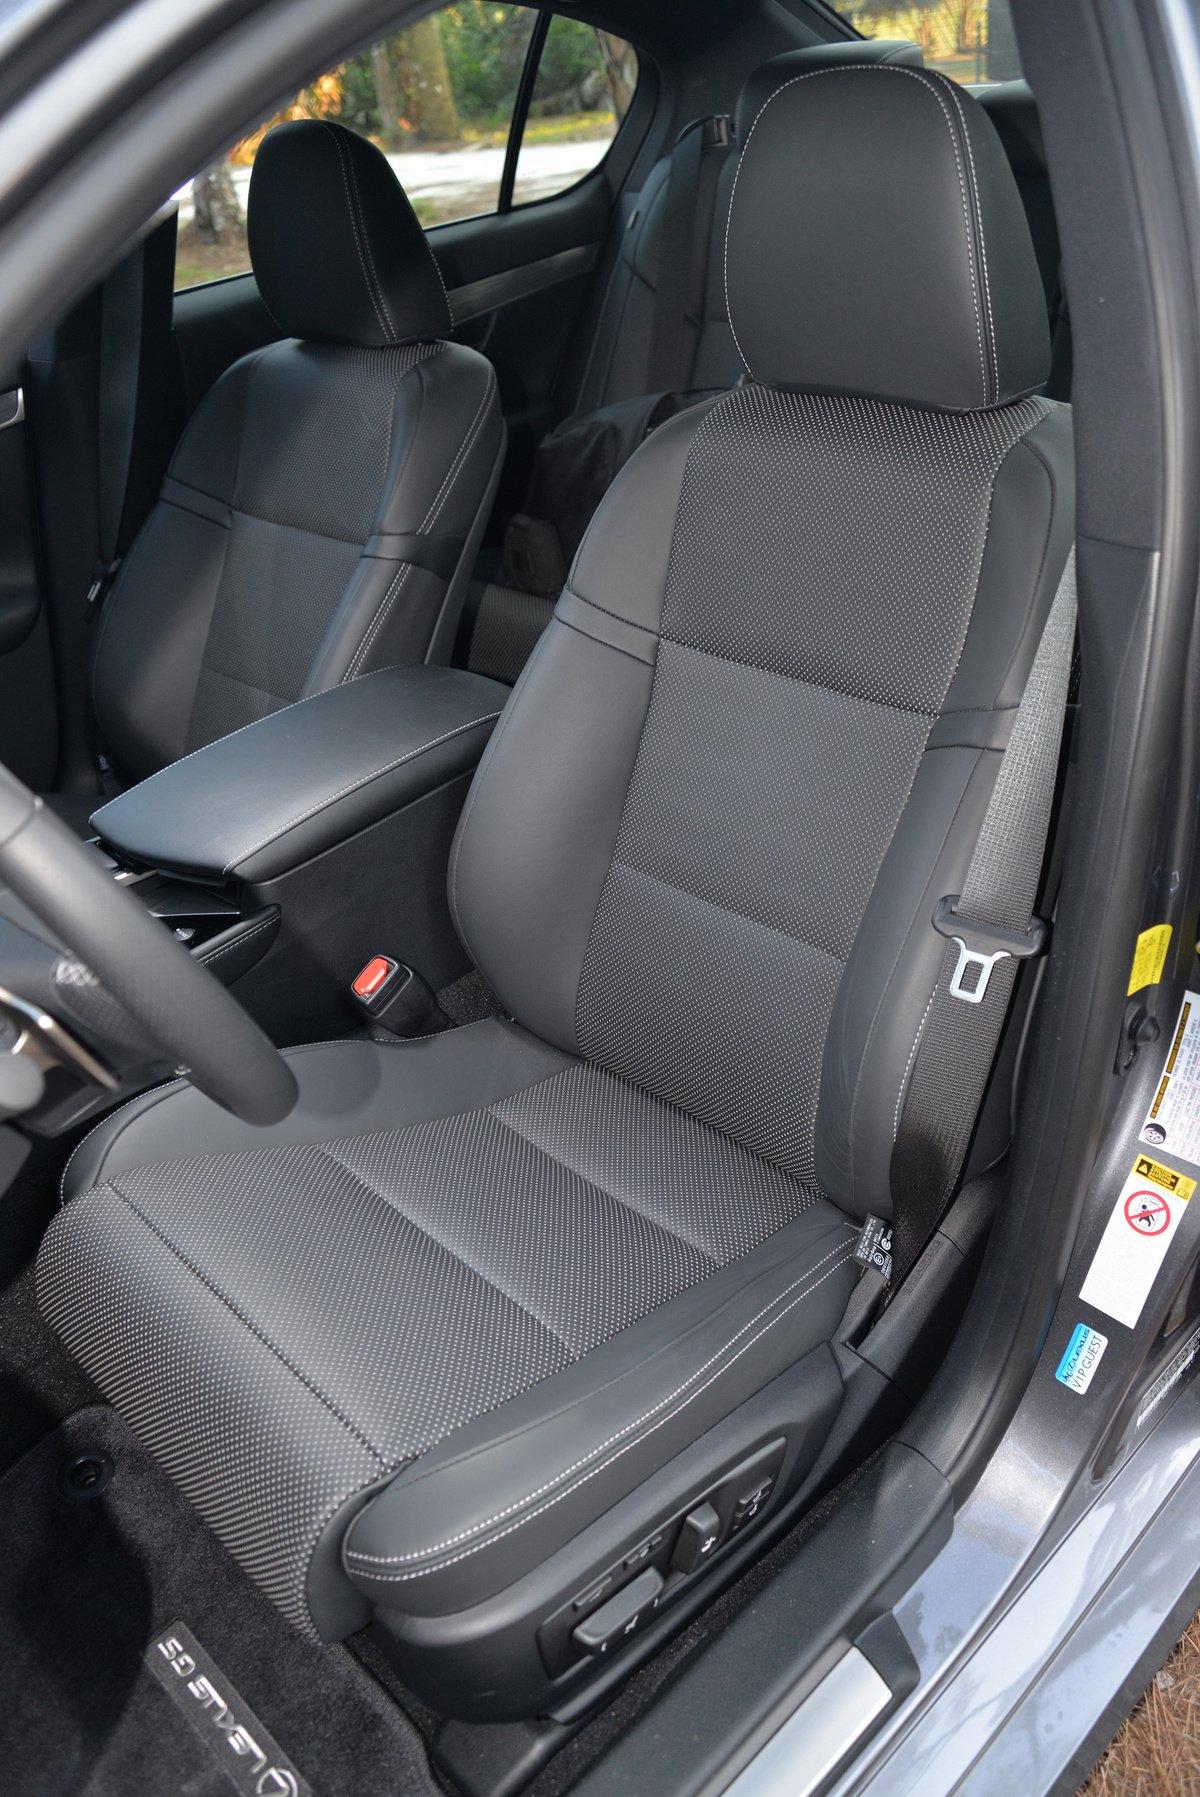 Тест драйв Lexus GS 350 F Sport 2014 года